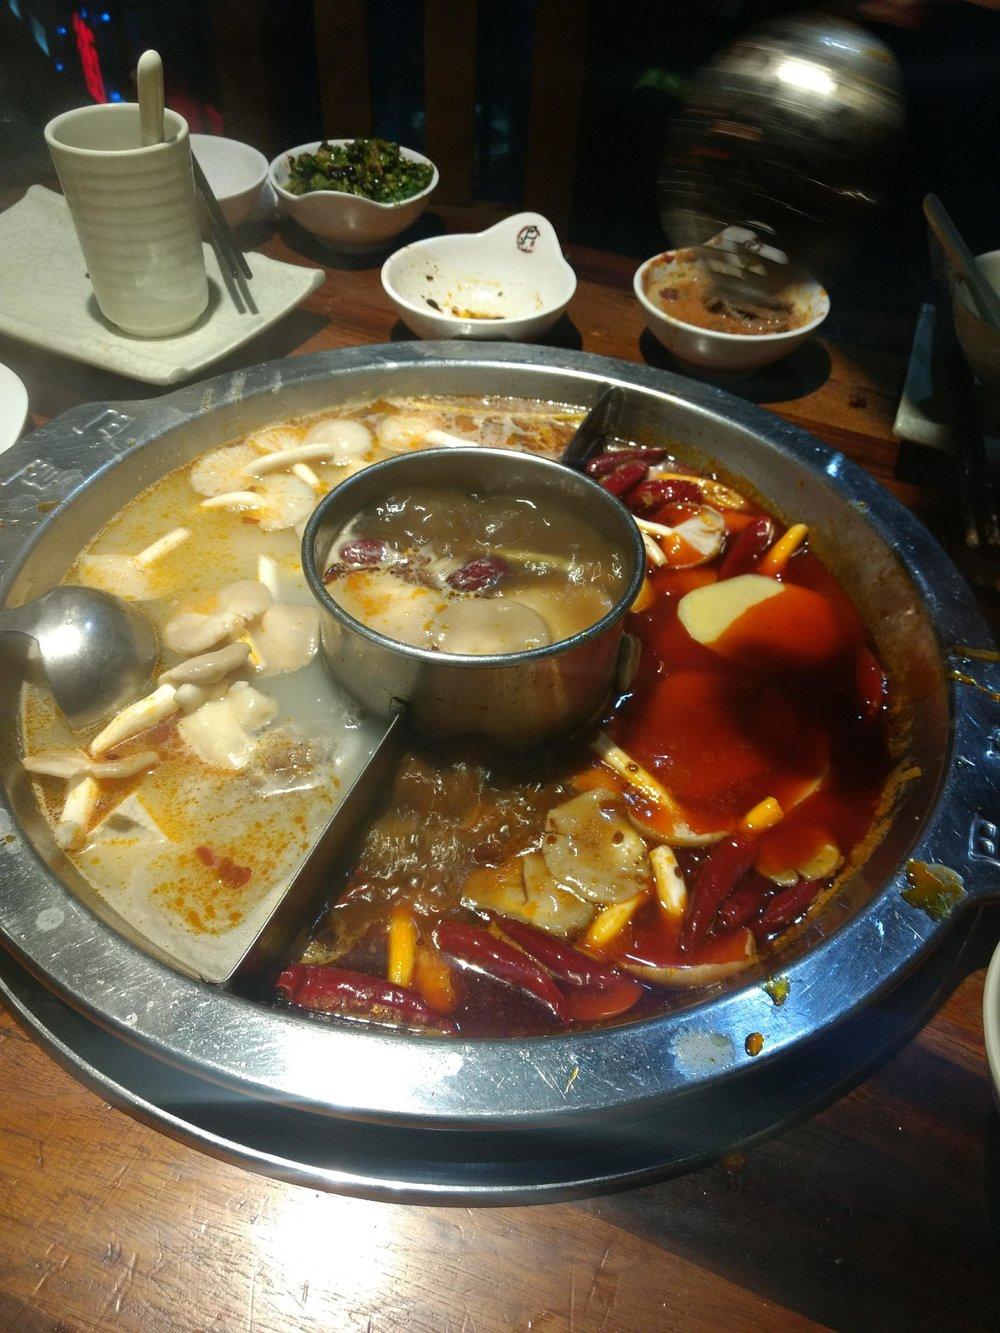 Hot pot, Szechuan style